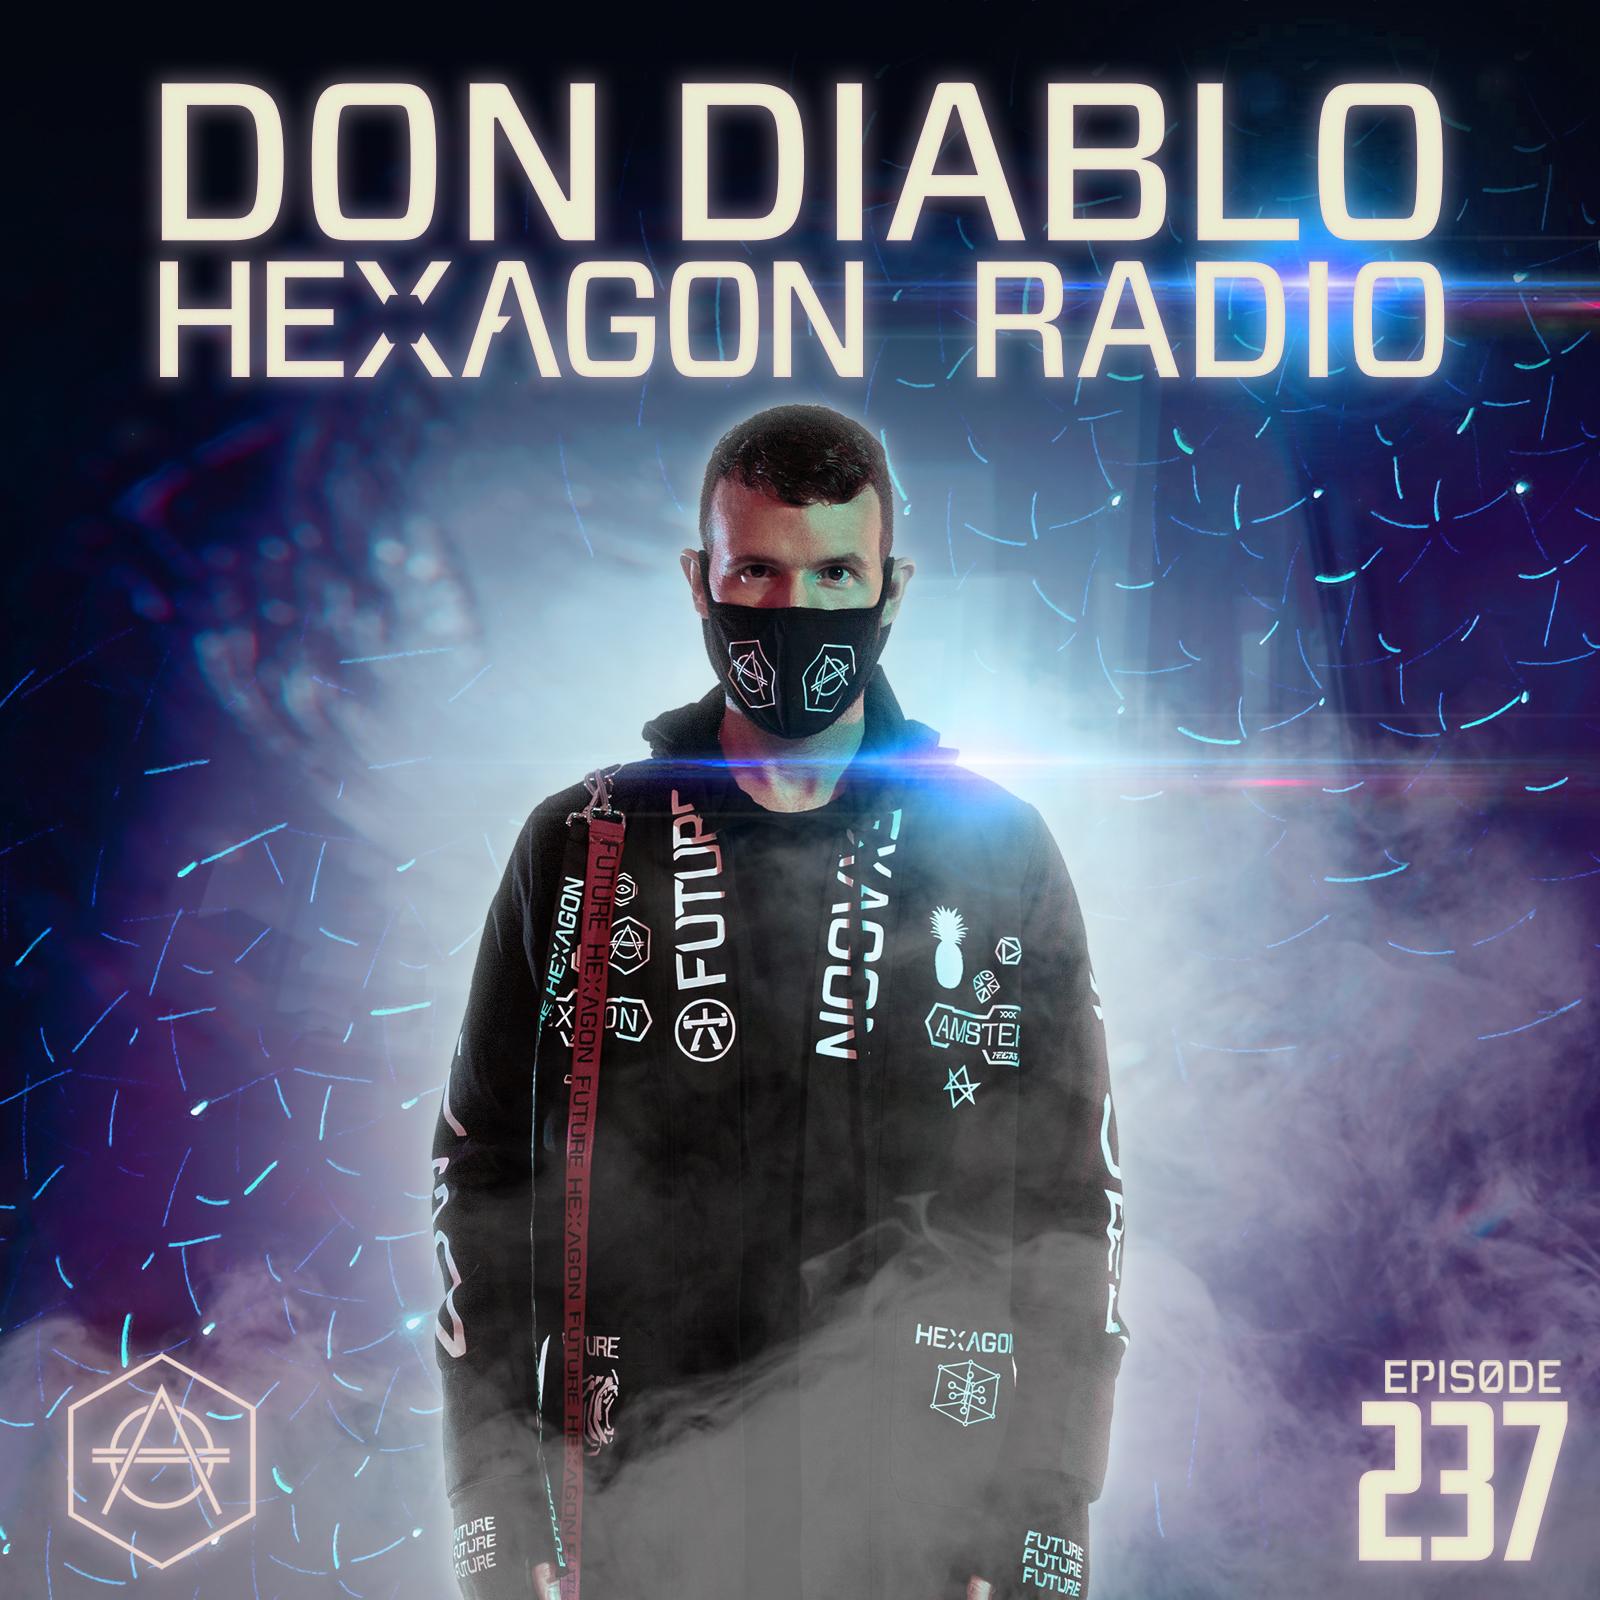 Don Diablo Presents Hexagon Radio